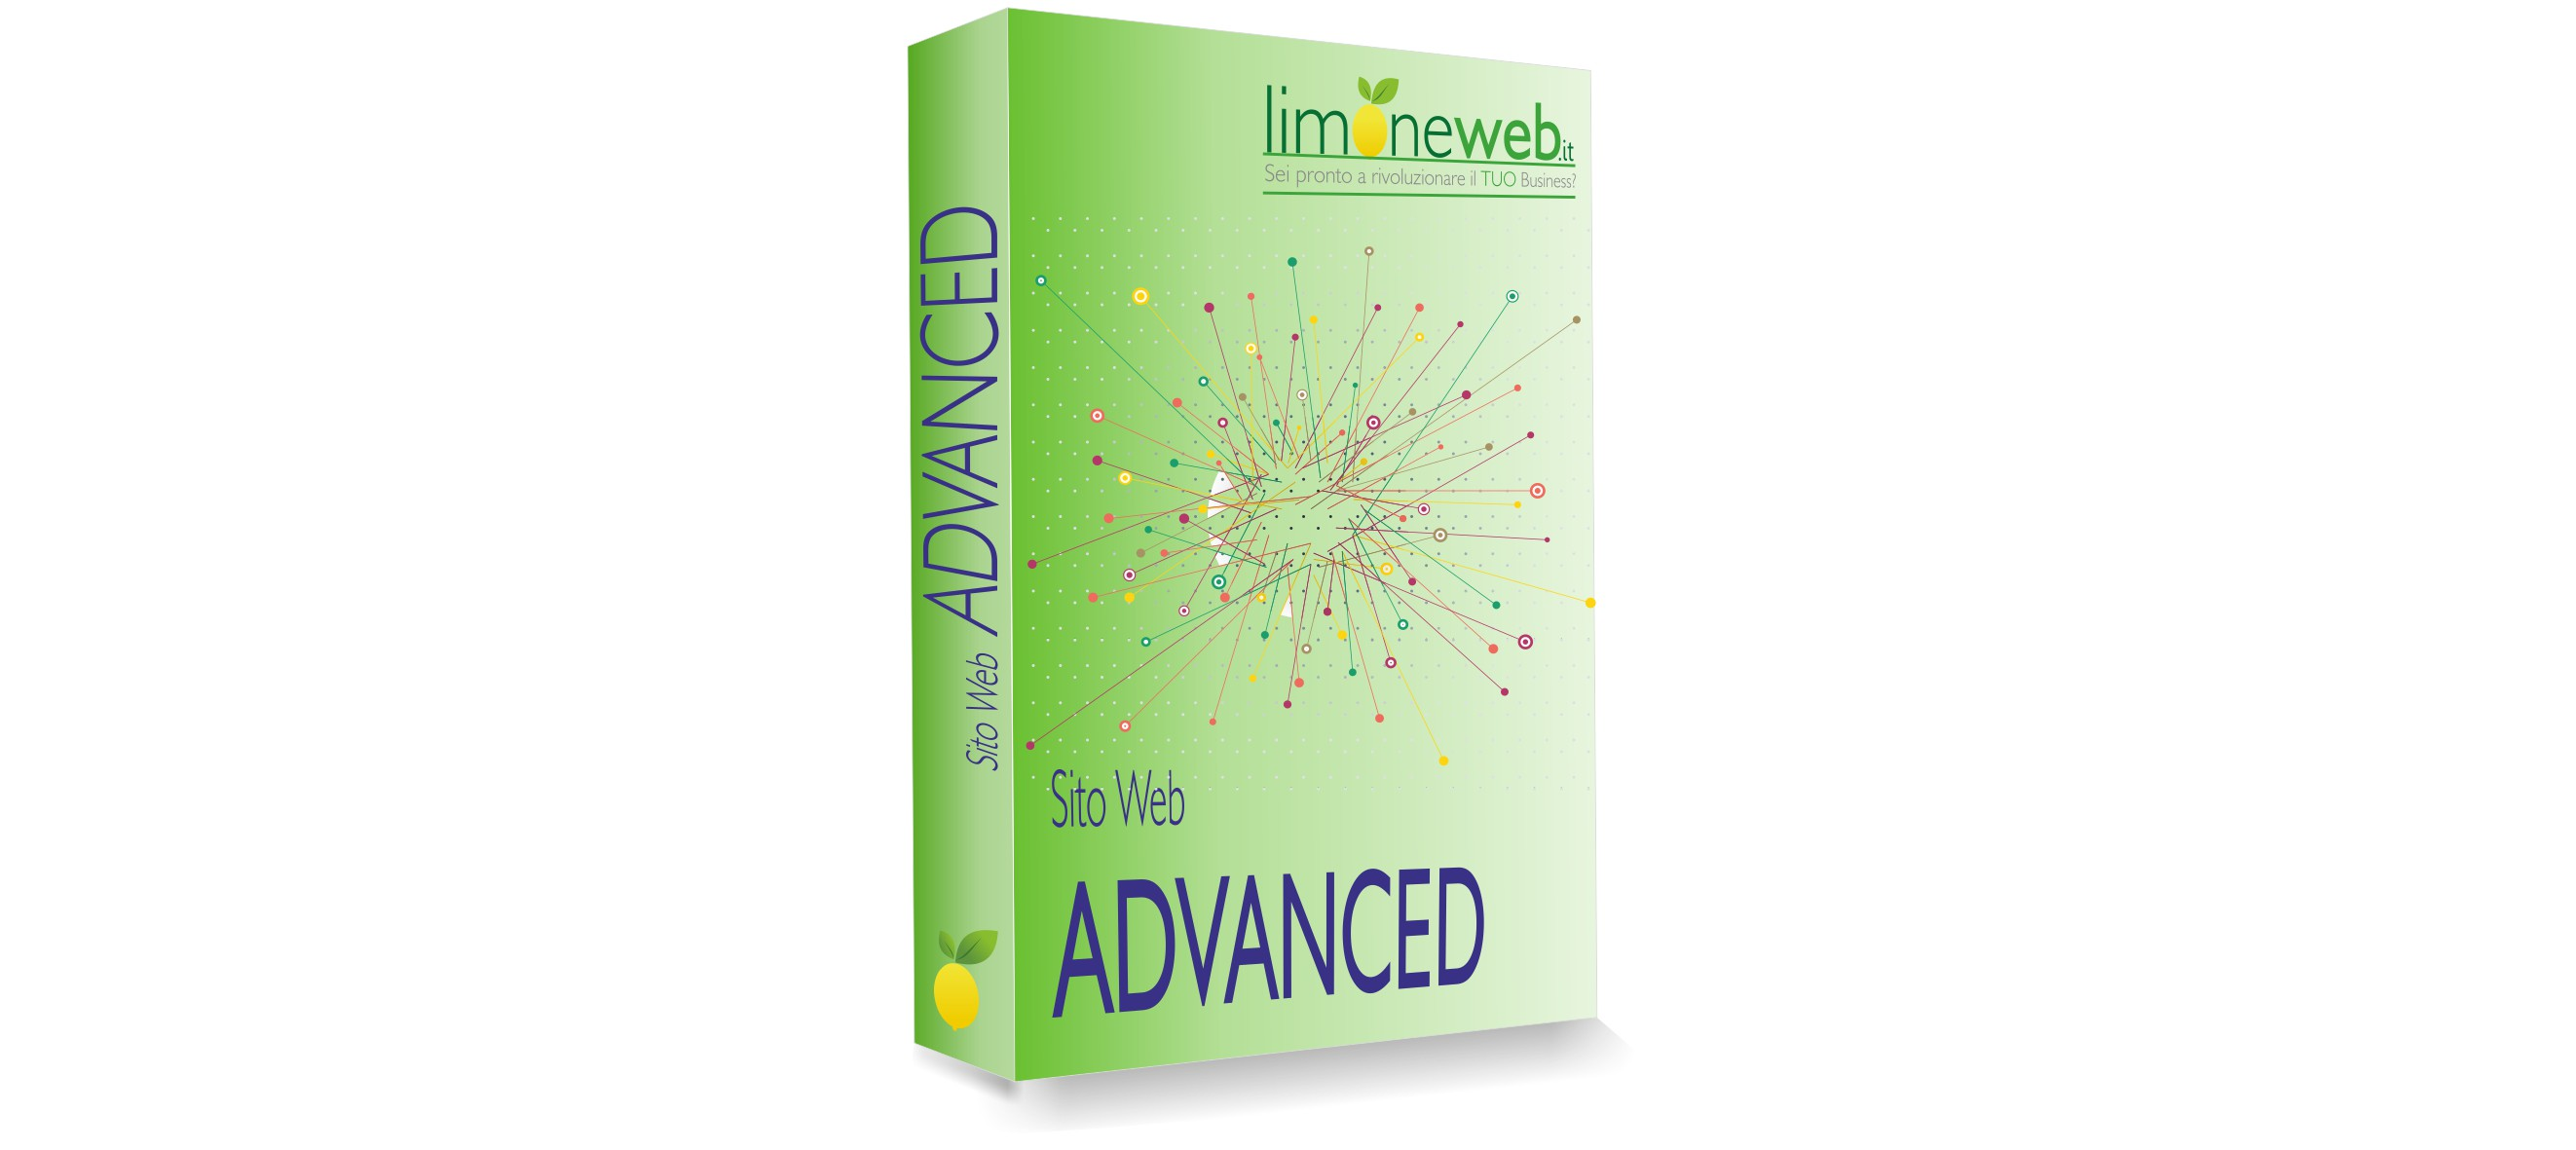 LimoneWeb.it - Sito Web Advanced